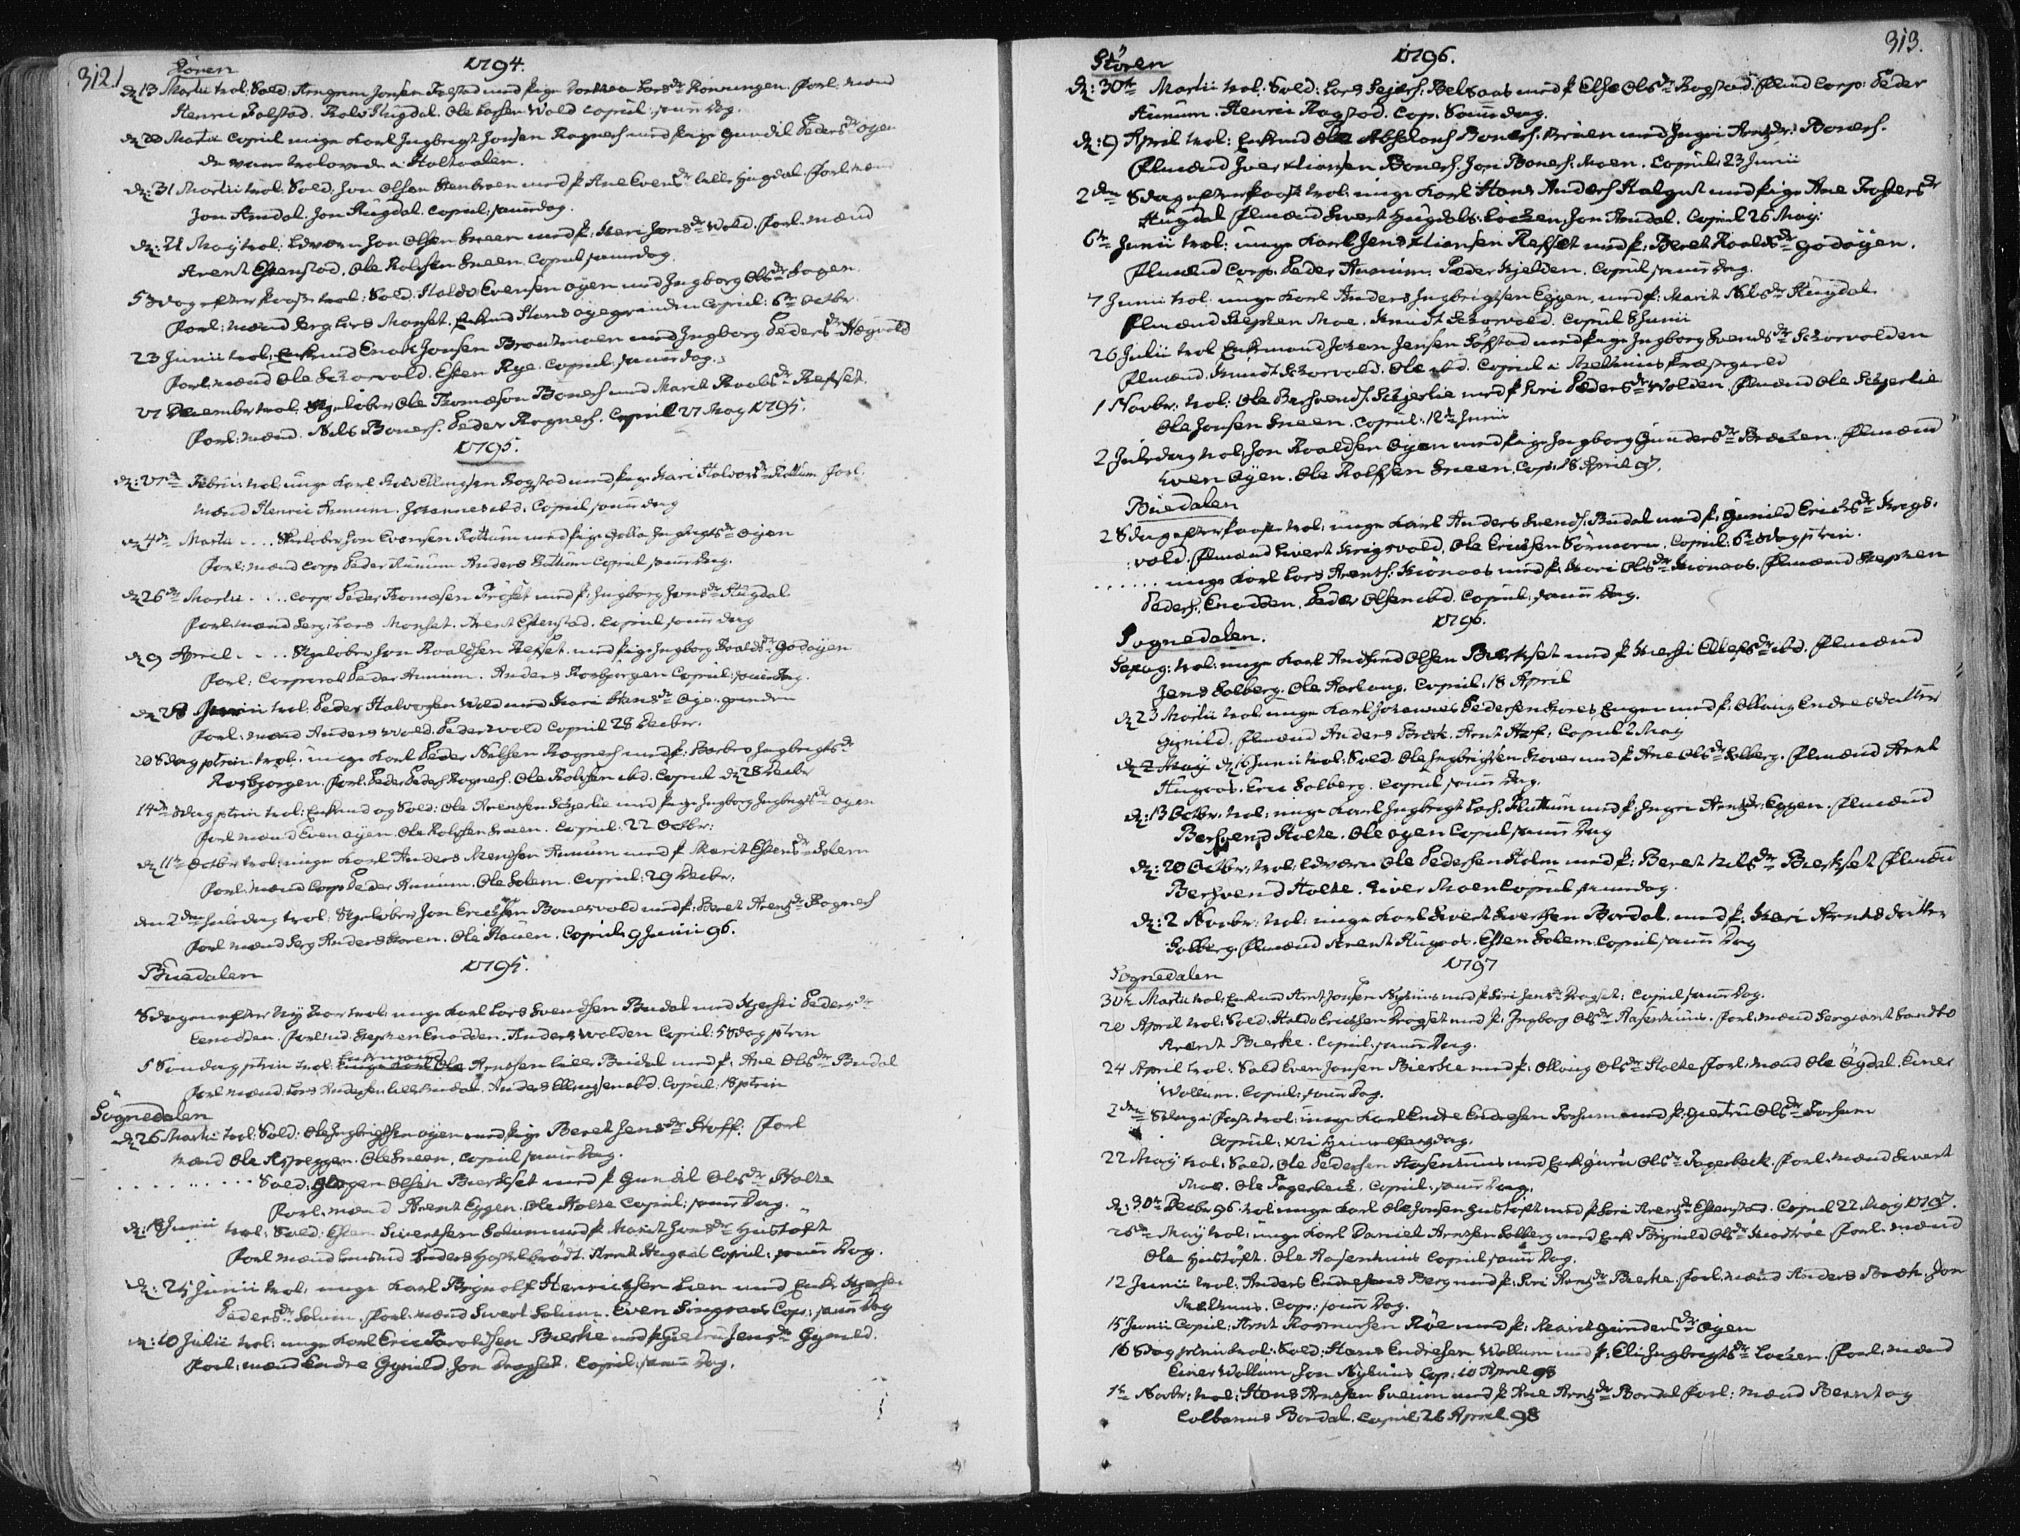 SAT, Ministerialprotokoller, klokkerbøker og fødselsregistre - Sør-Trøndelag, 687/L0992: Parish register (official) no. 687A03 /1, 1788-1815, p. 312-313